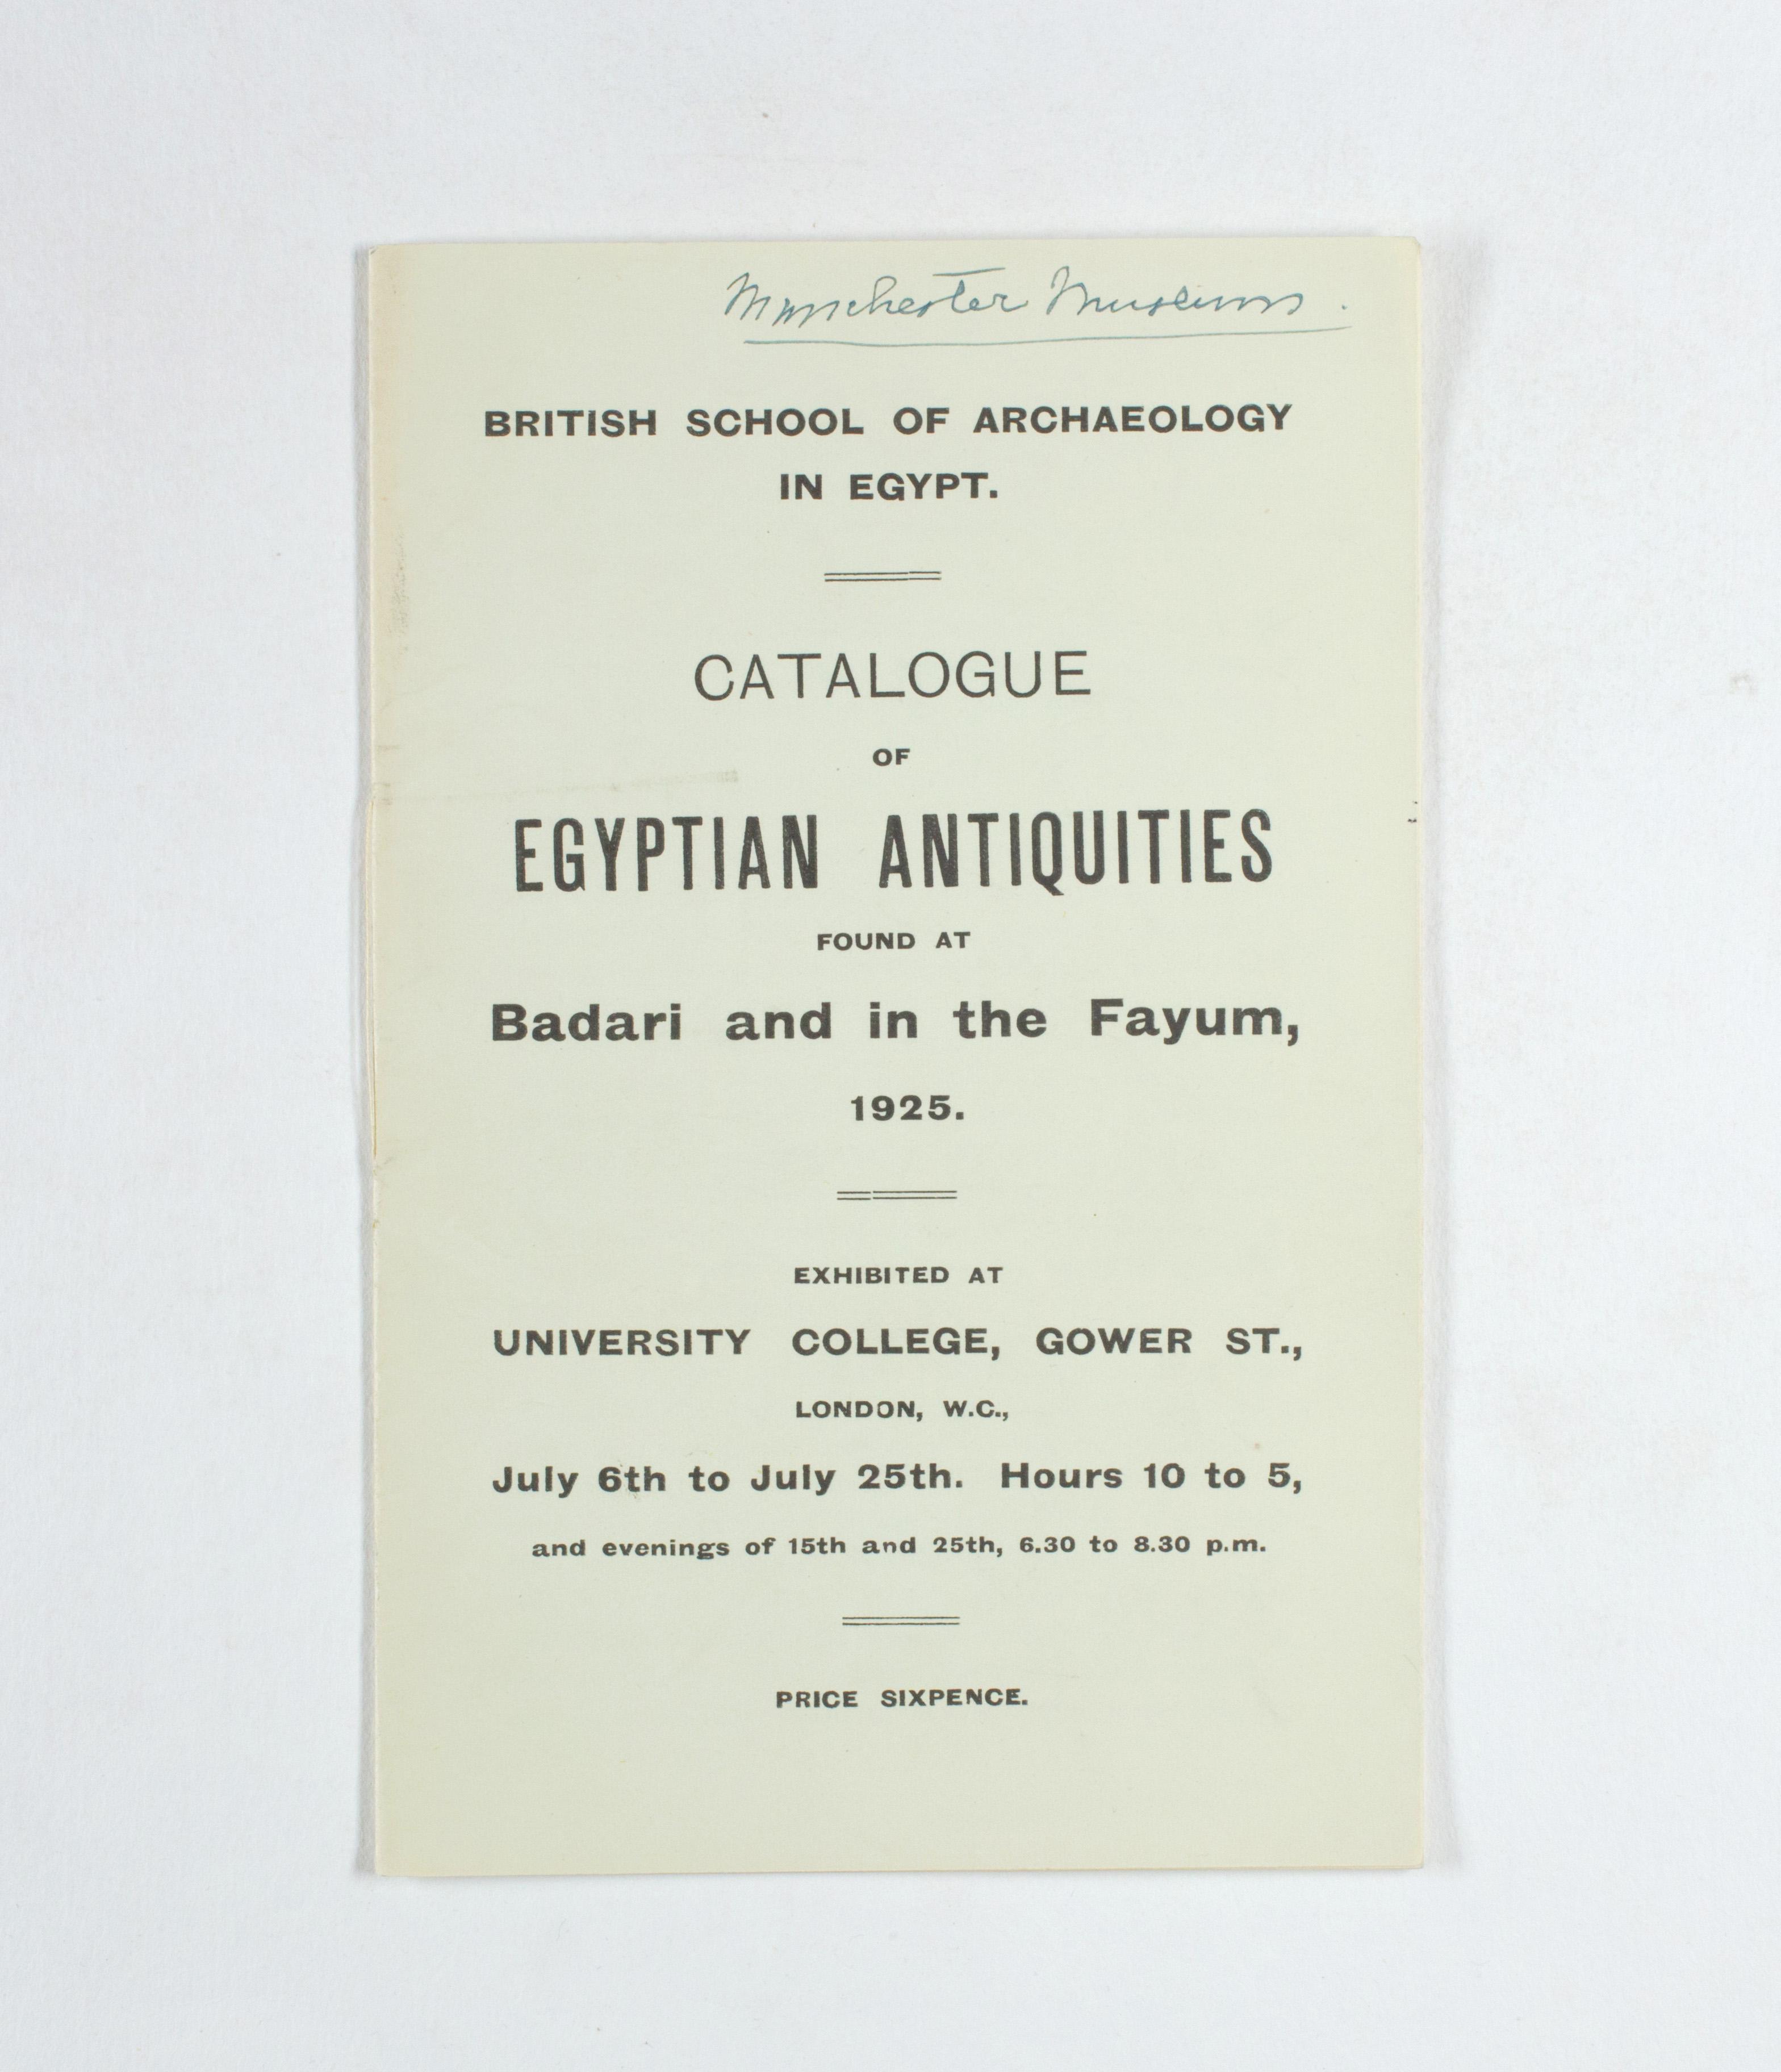 1924-25 Badari, Faiyum Exhibition catalogue PMA/WFP1/D/28/31.1